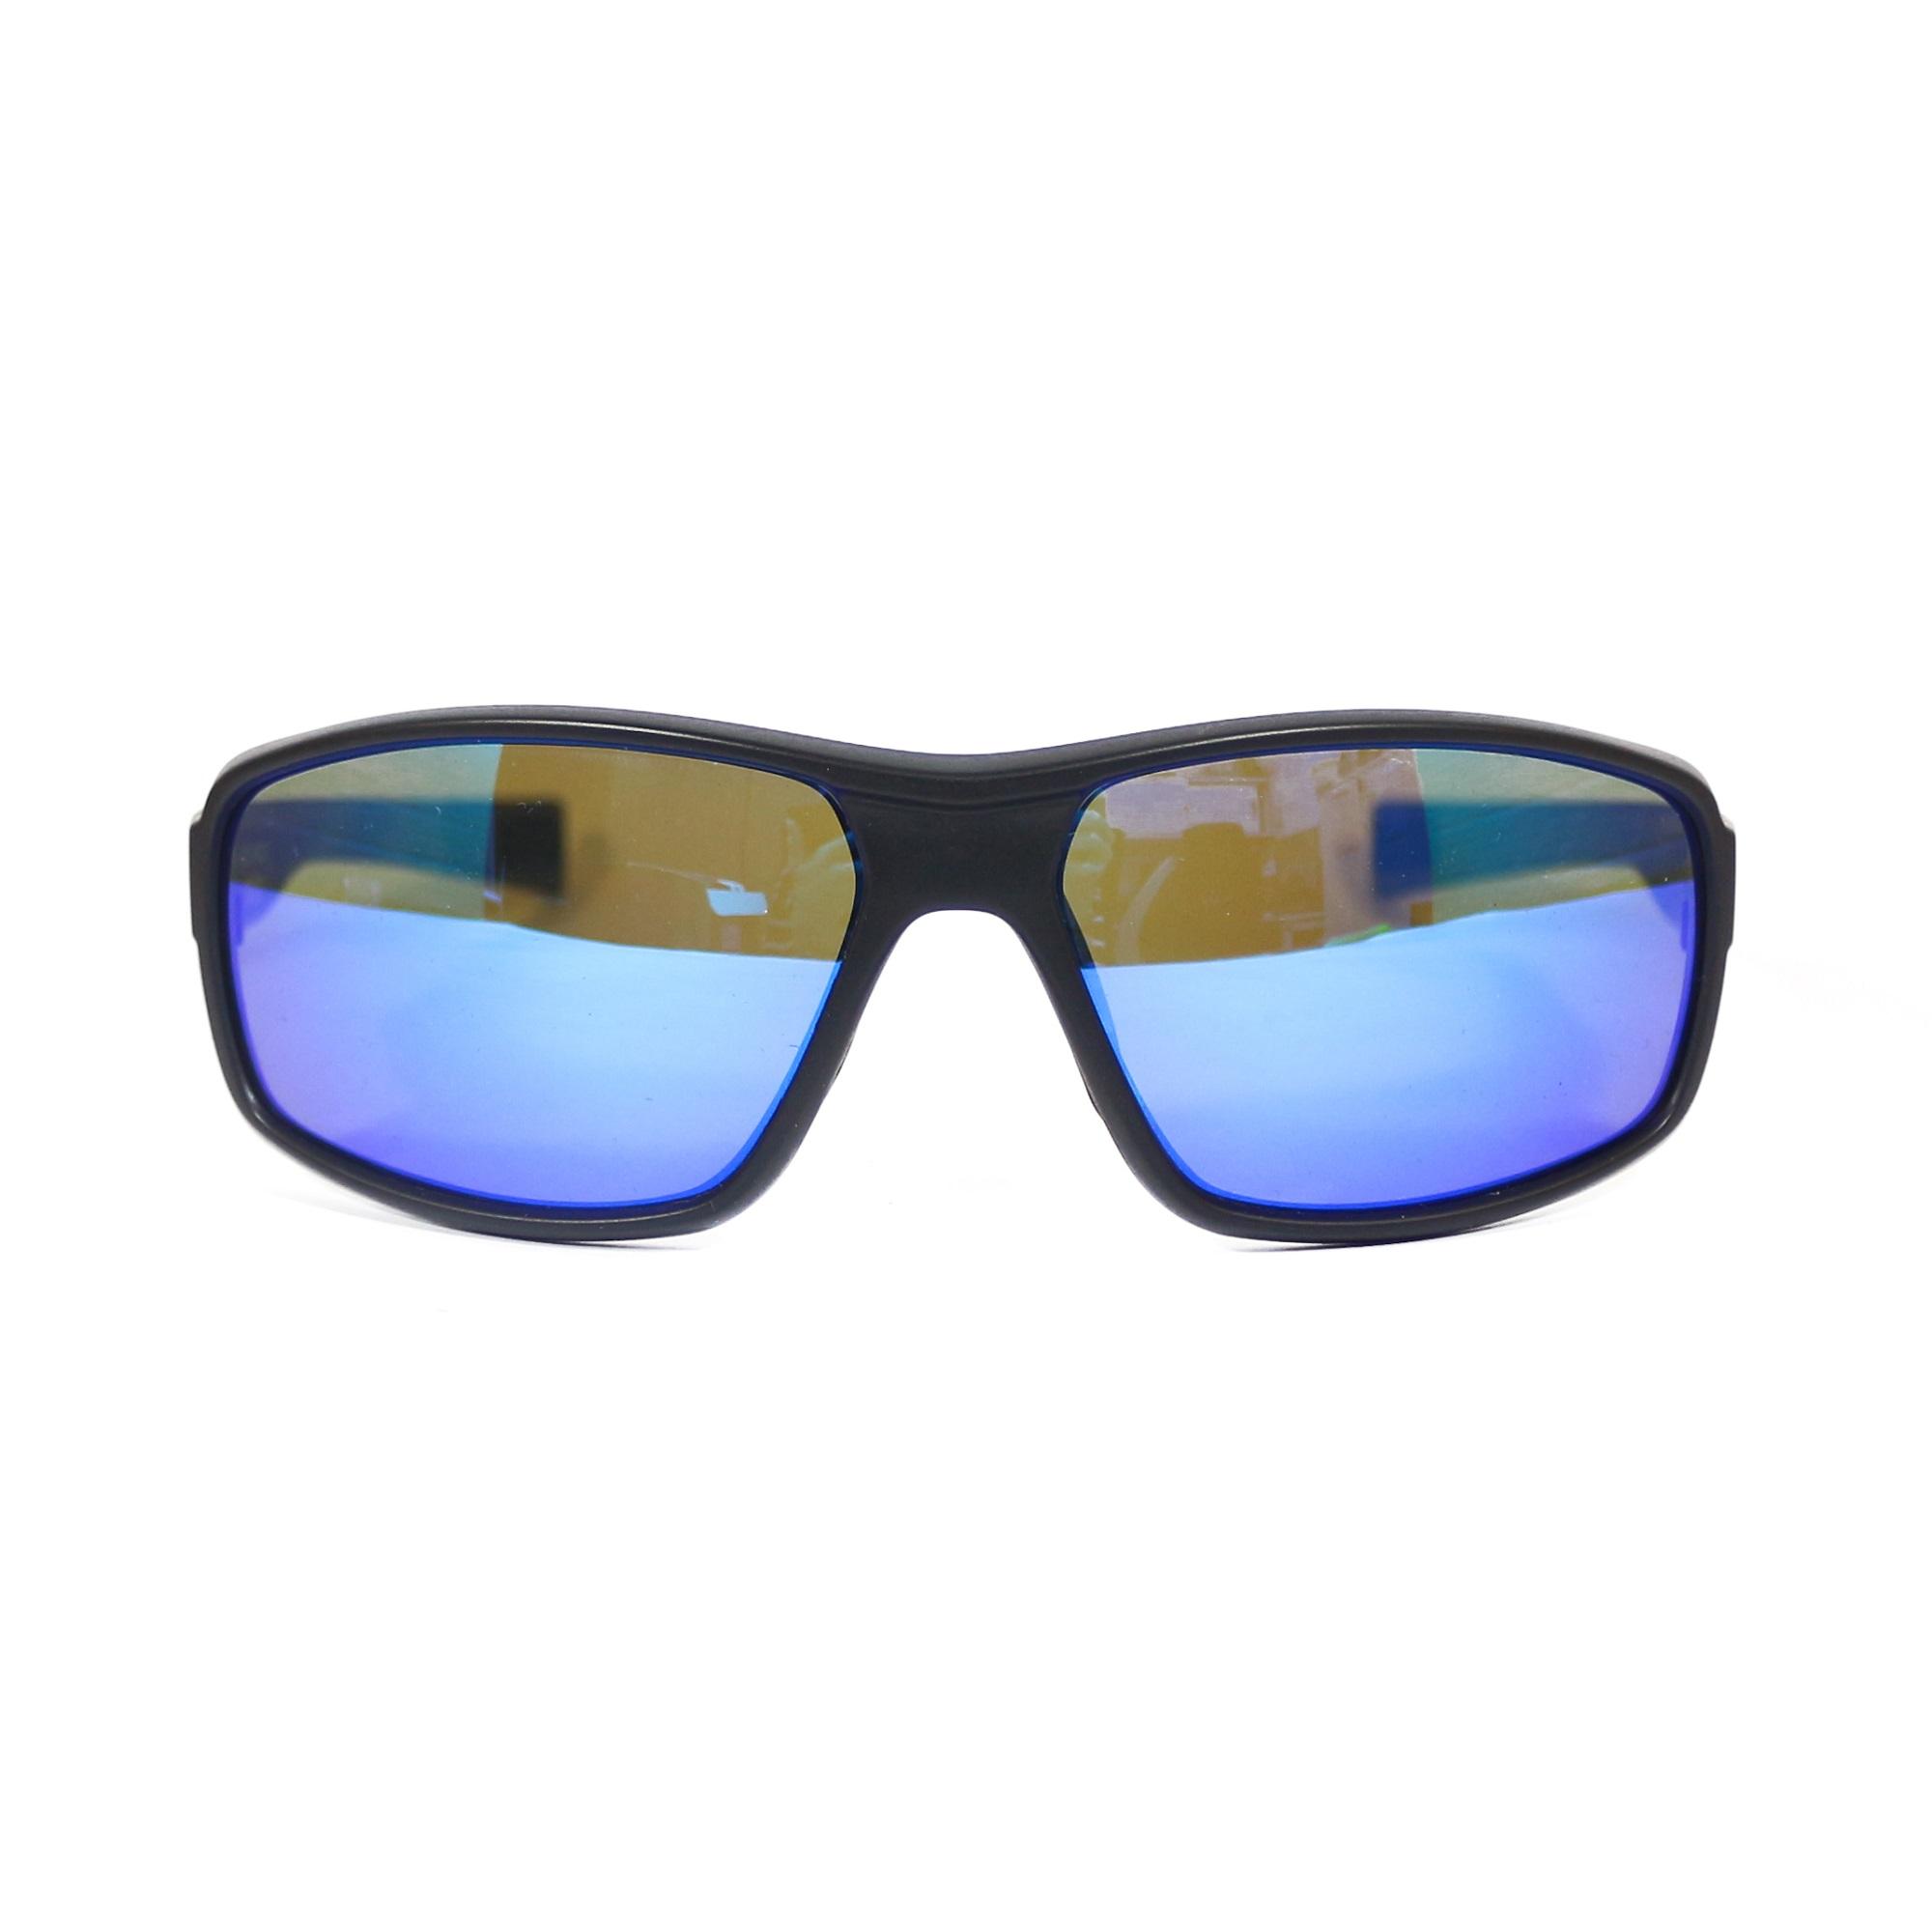 Zeque Polarised Fishing Sunglasses Bunny Walk BW-0203M Gray / BM (1201)